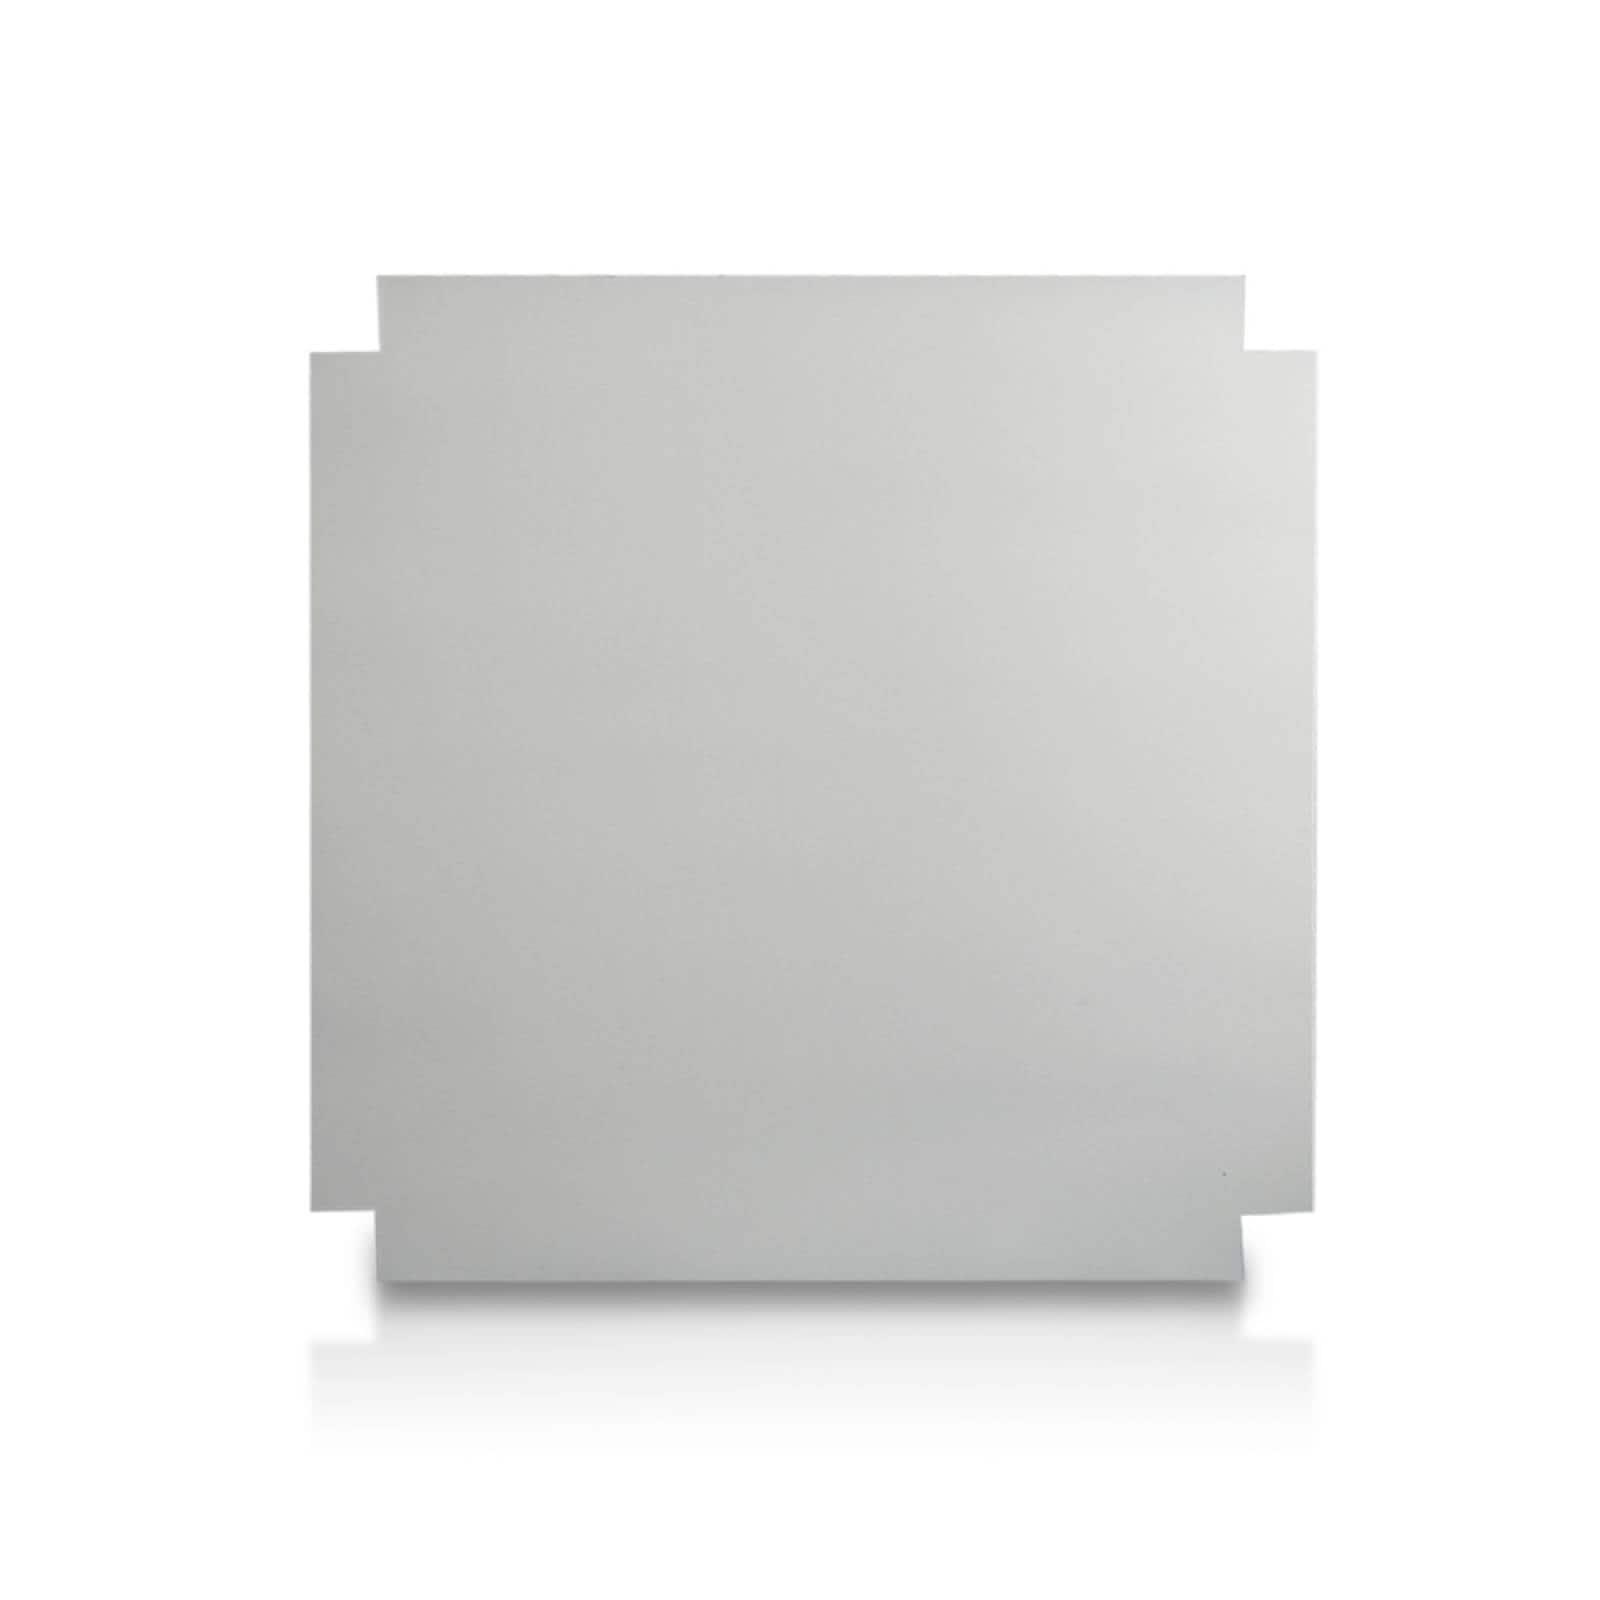 Aislante Cerámico Protector Térmico para Pared de 52 x 45 cm Blanco, Mod: 4PTPBl